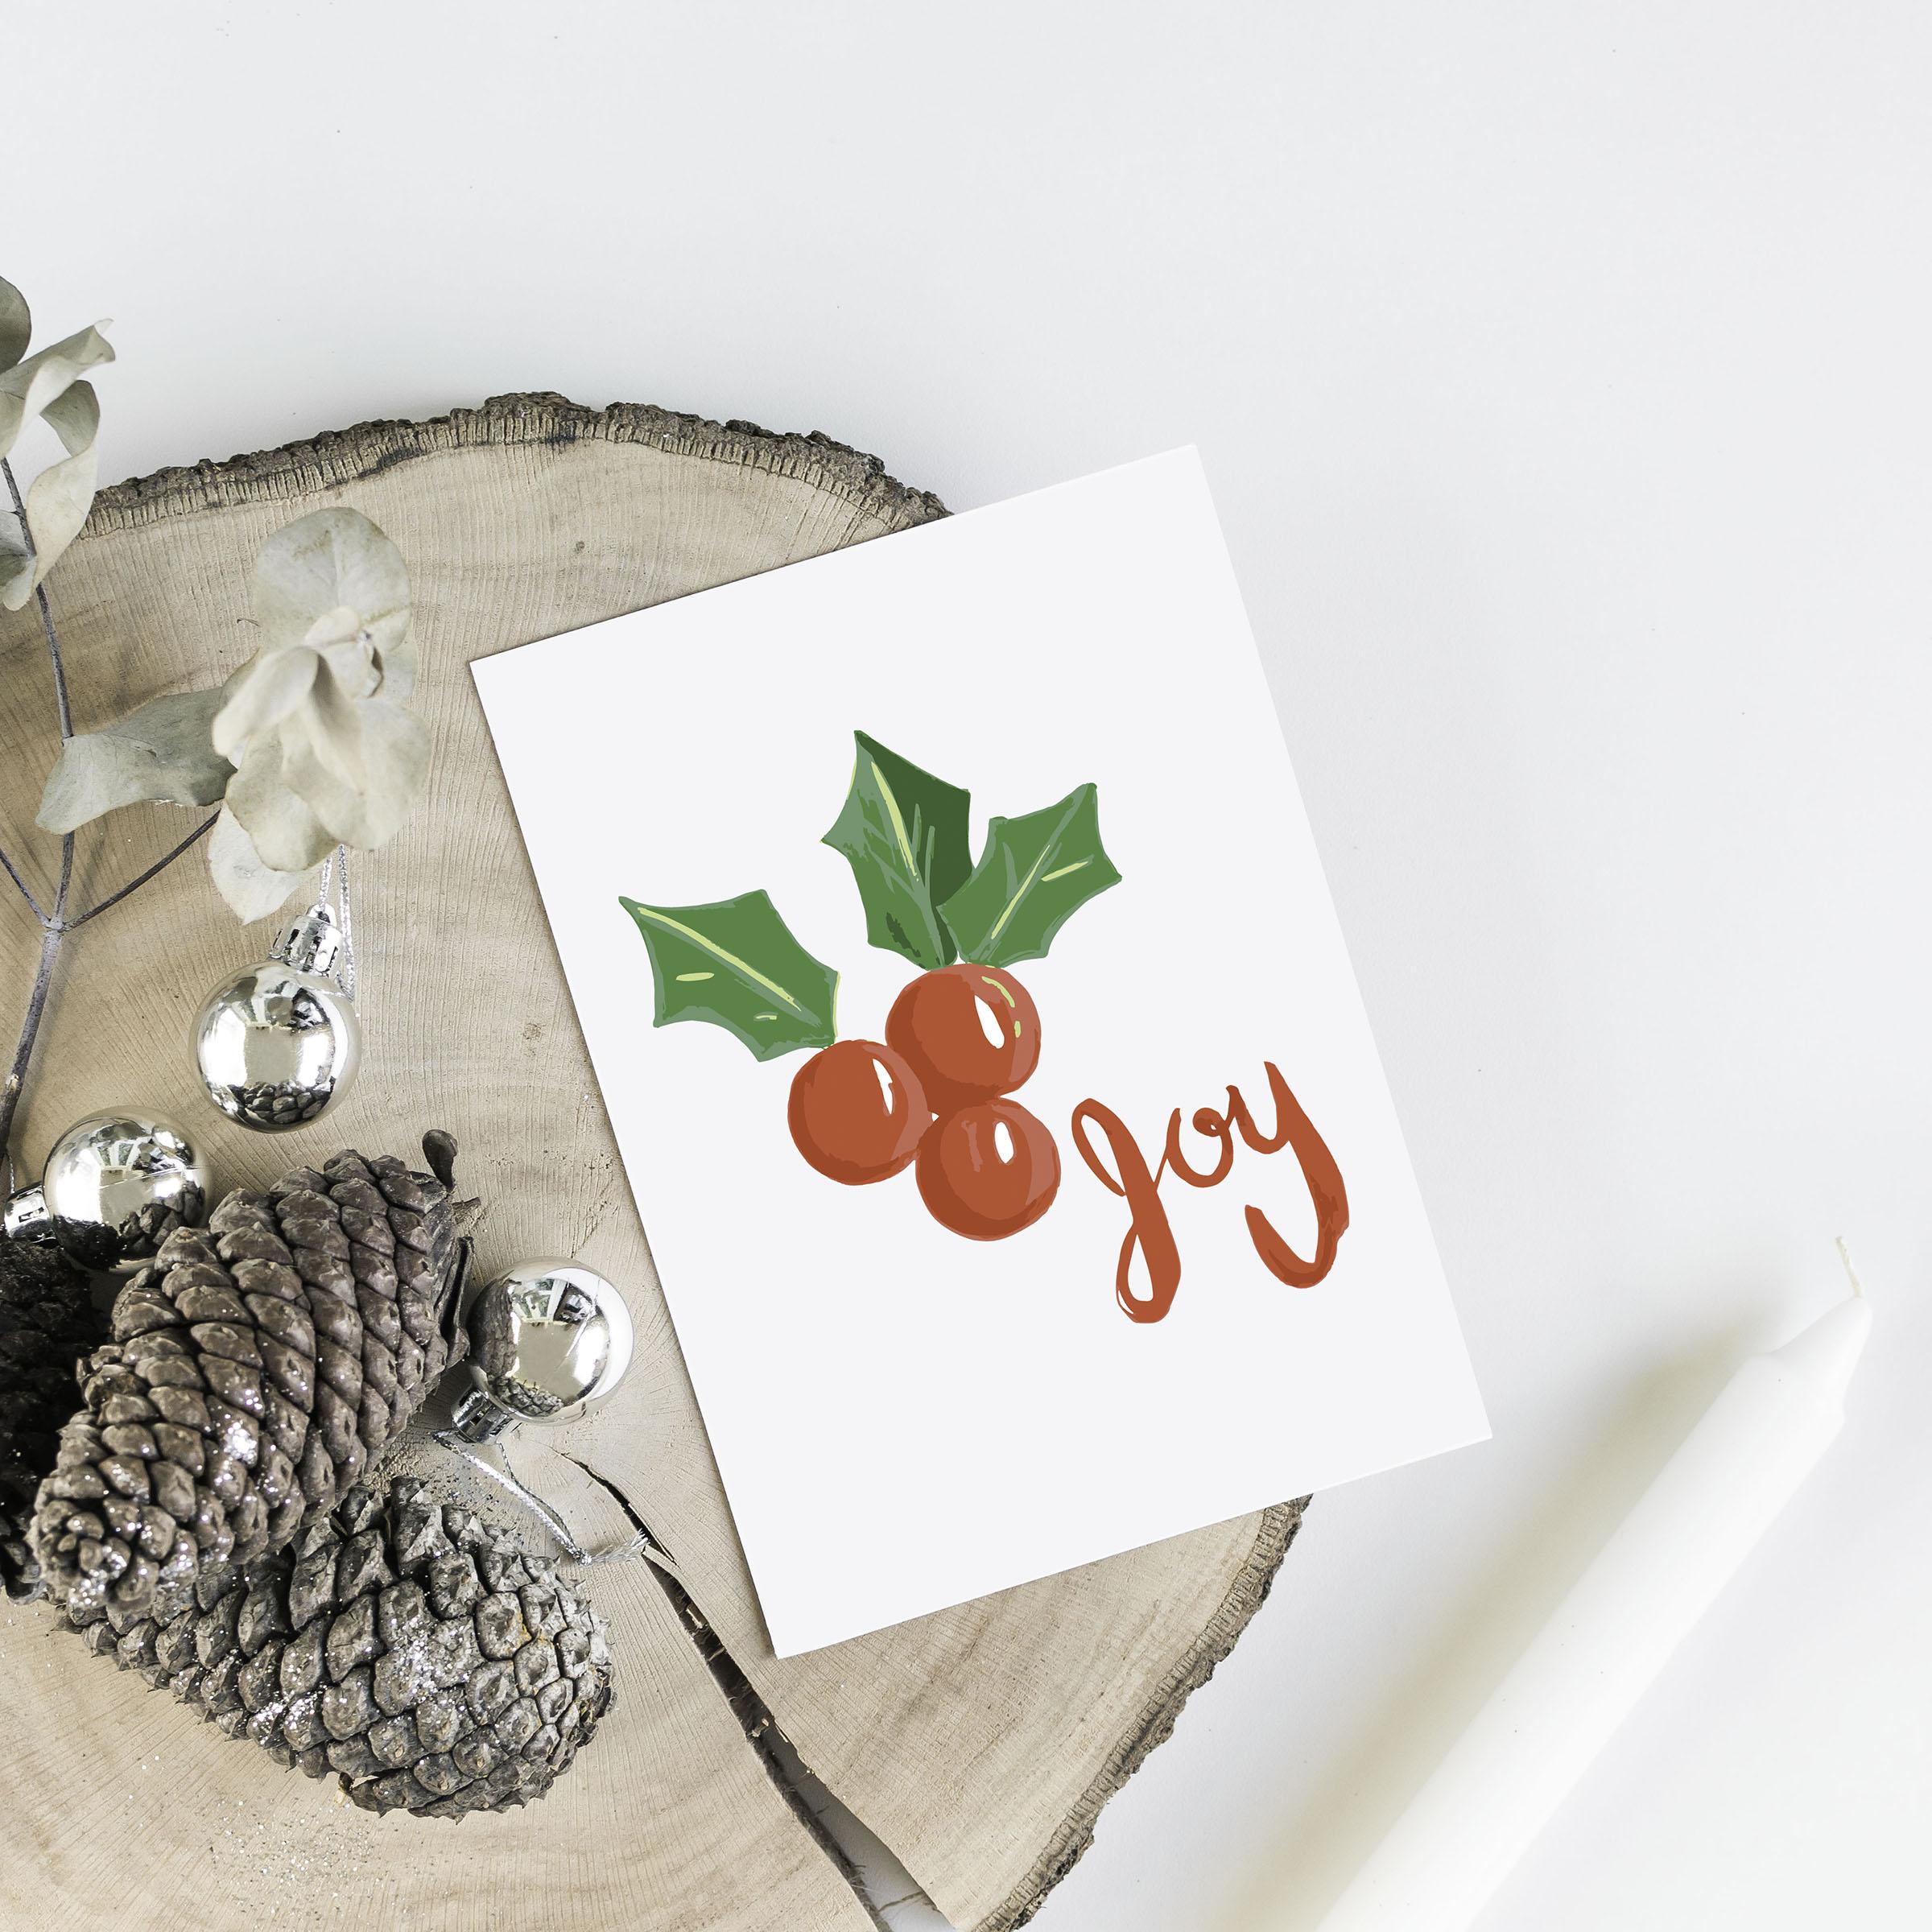 Holly and Joy Card